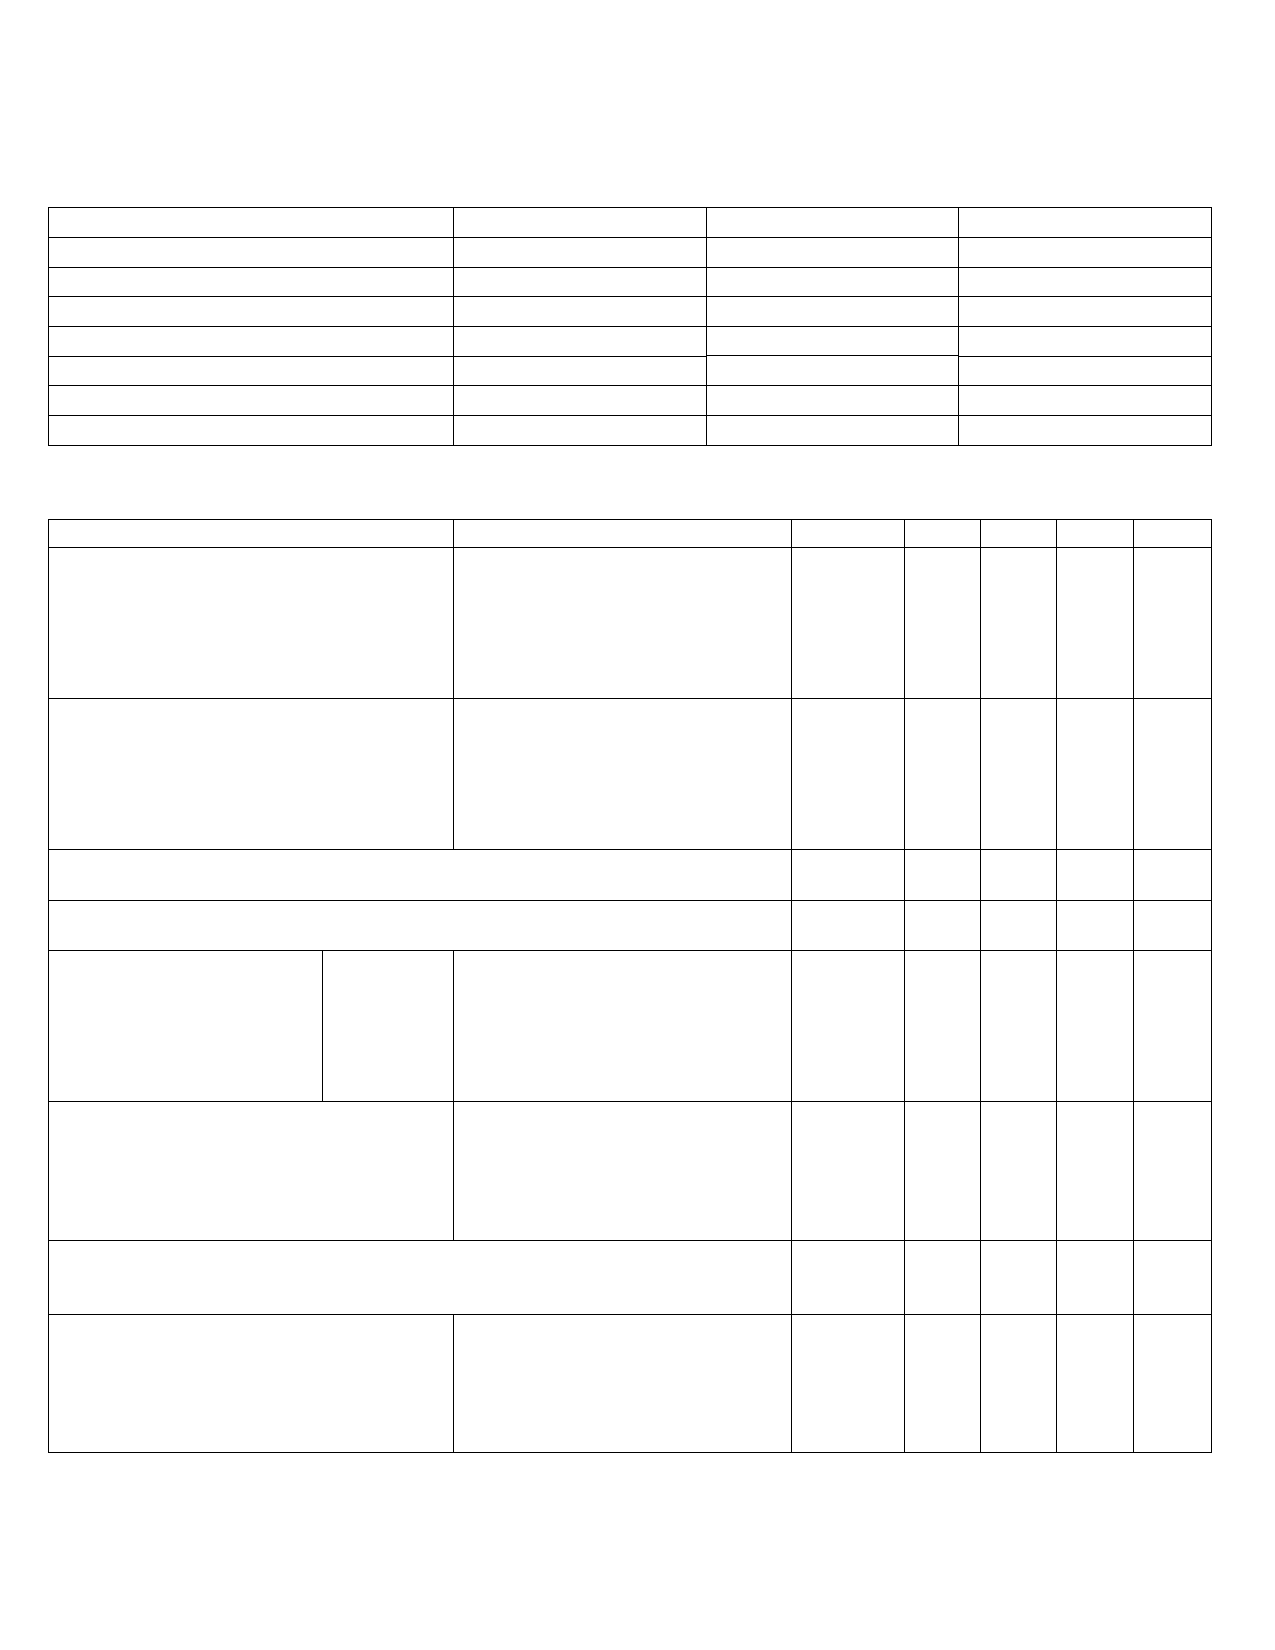 2N2417B 데이터시트 및 2N2417B PDF